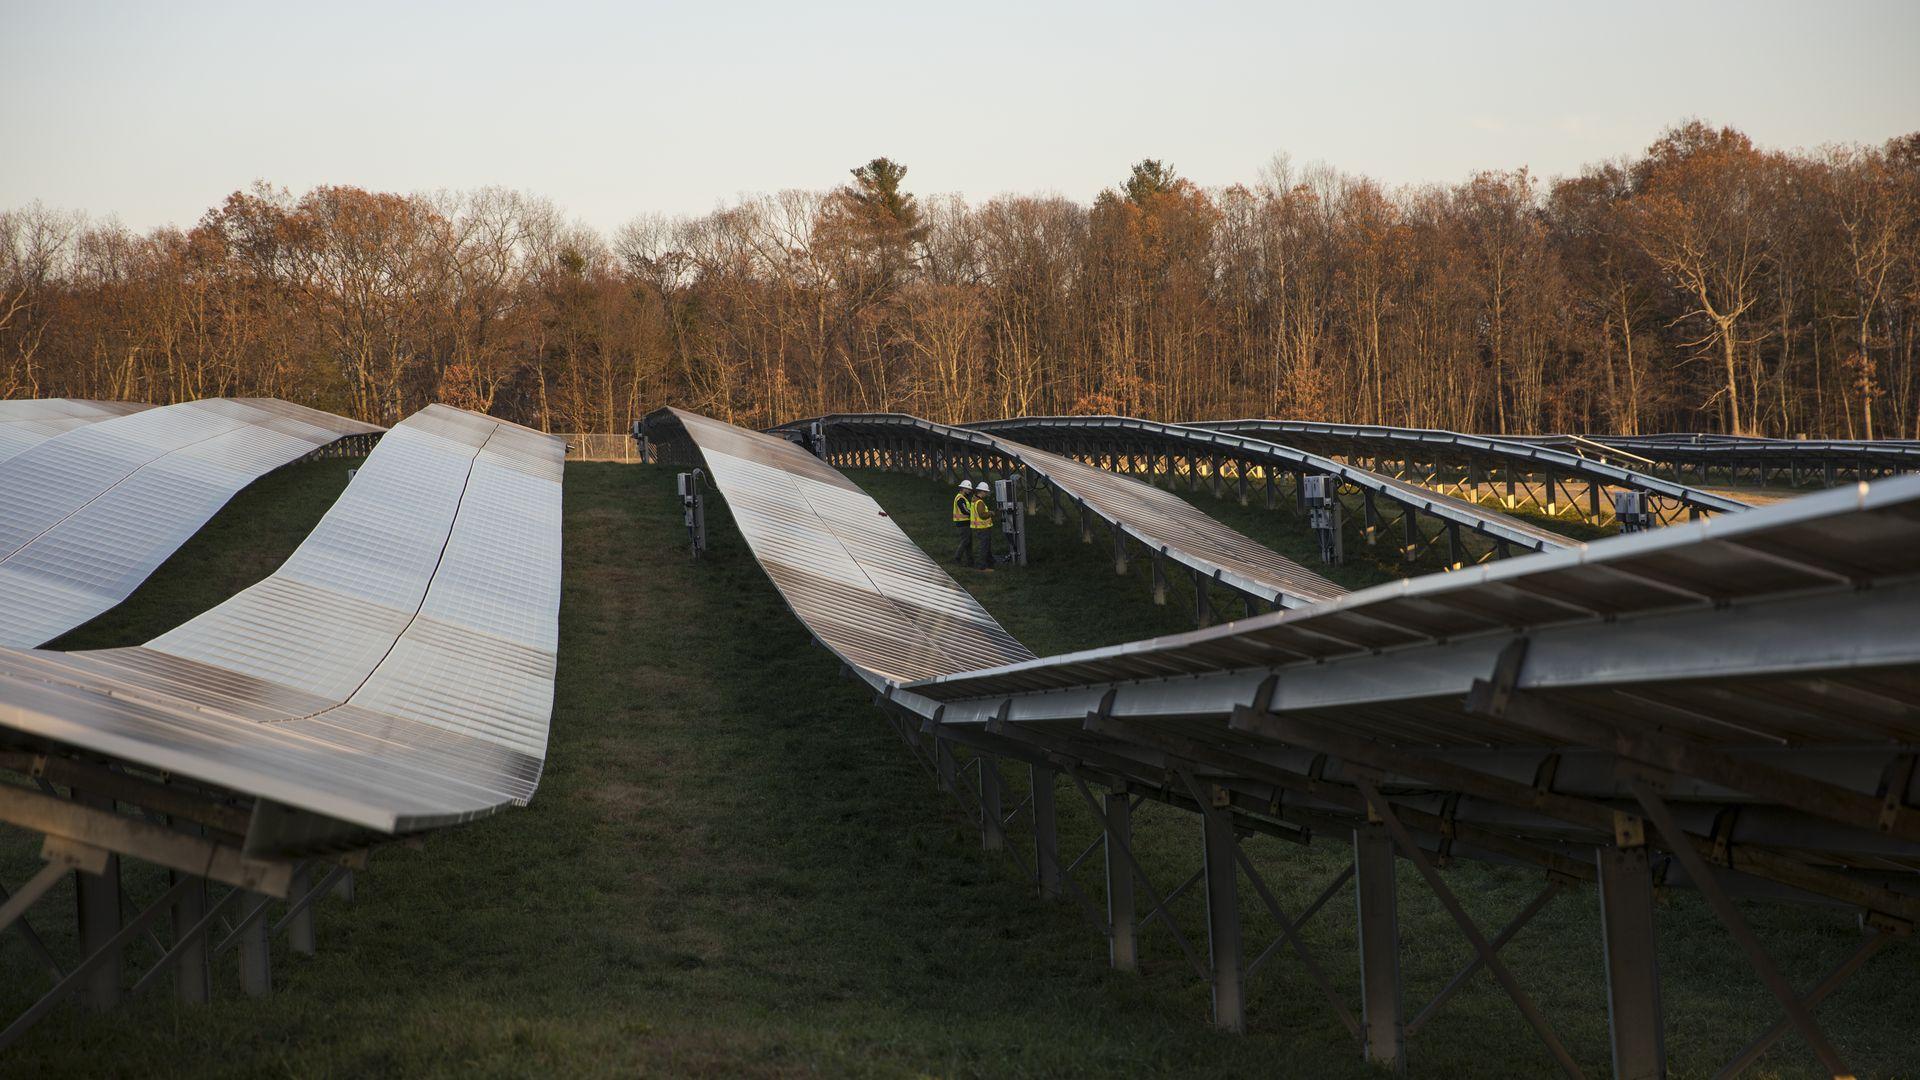 Trump S Solar Tariffs Won T Bring Back Manufacturing From